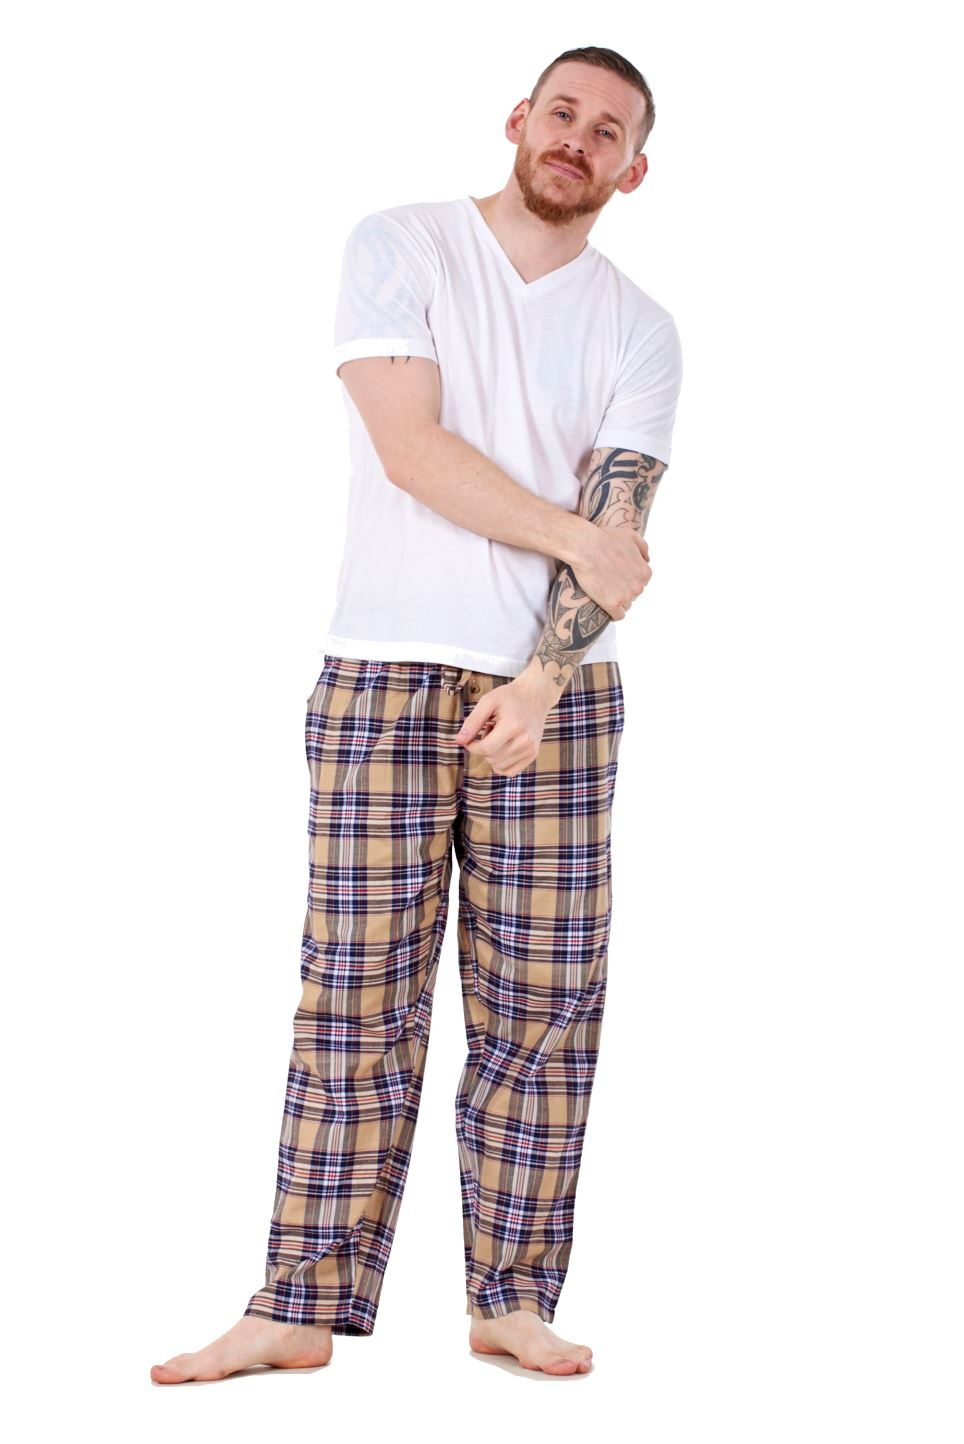 Mens-Pyjama-Bottoms-Rich-Cotton-Woven-Check-Lounge-Pant-Nightwear-Big-3XL-to-5XL Indexbild 30